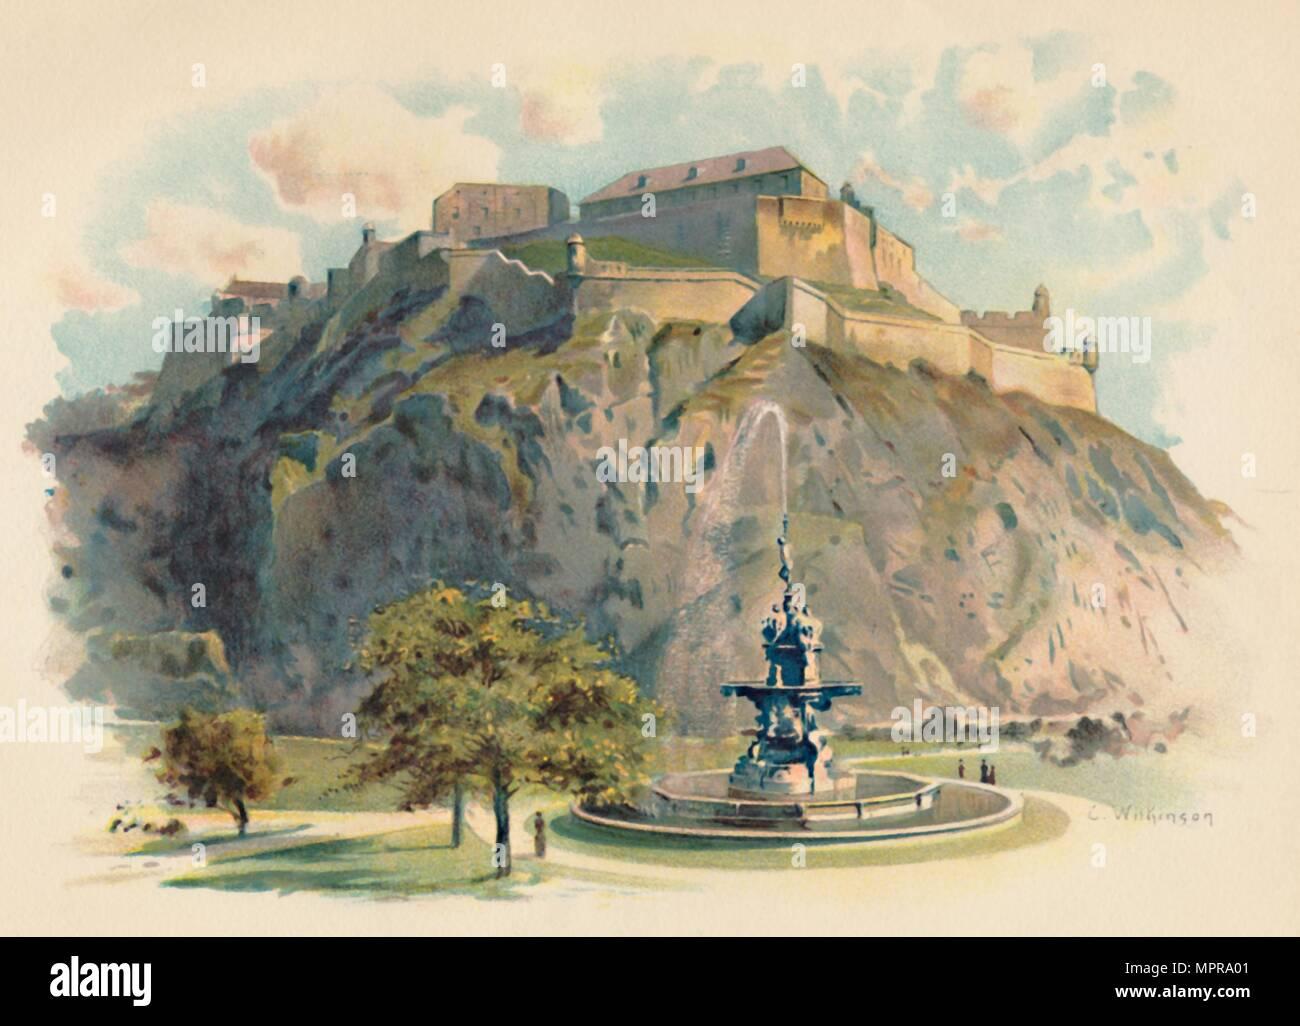 'The Castle Rock, Edinburgh', c1890. Artist: Charles Wilkinson. - Stock Image